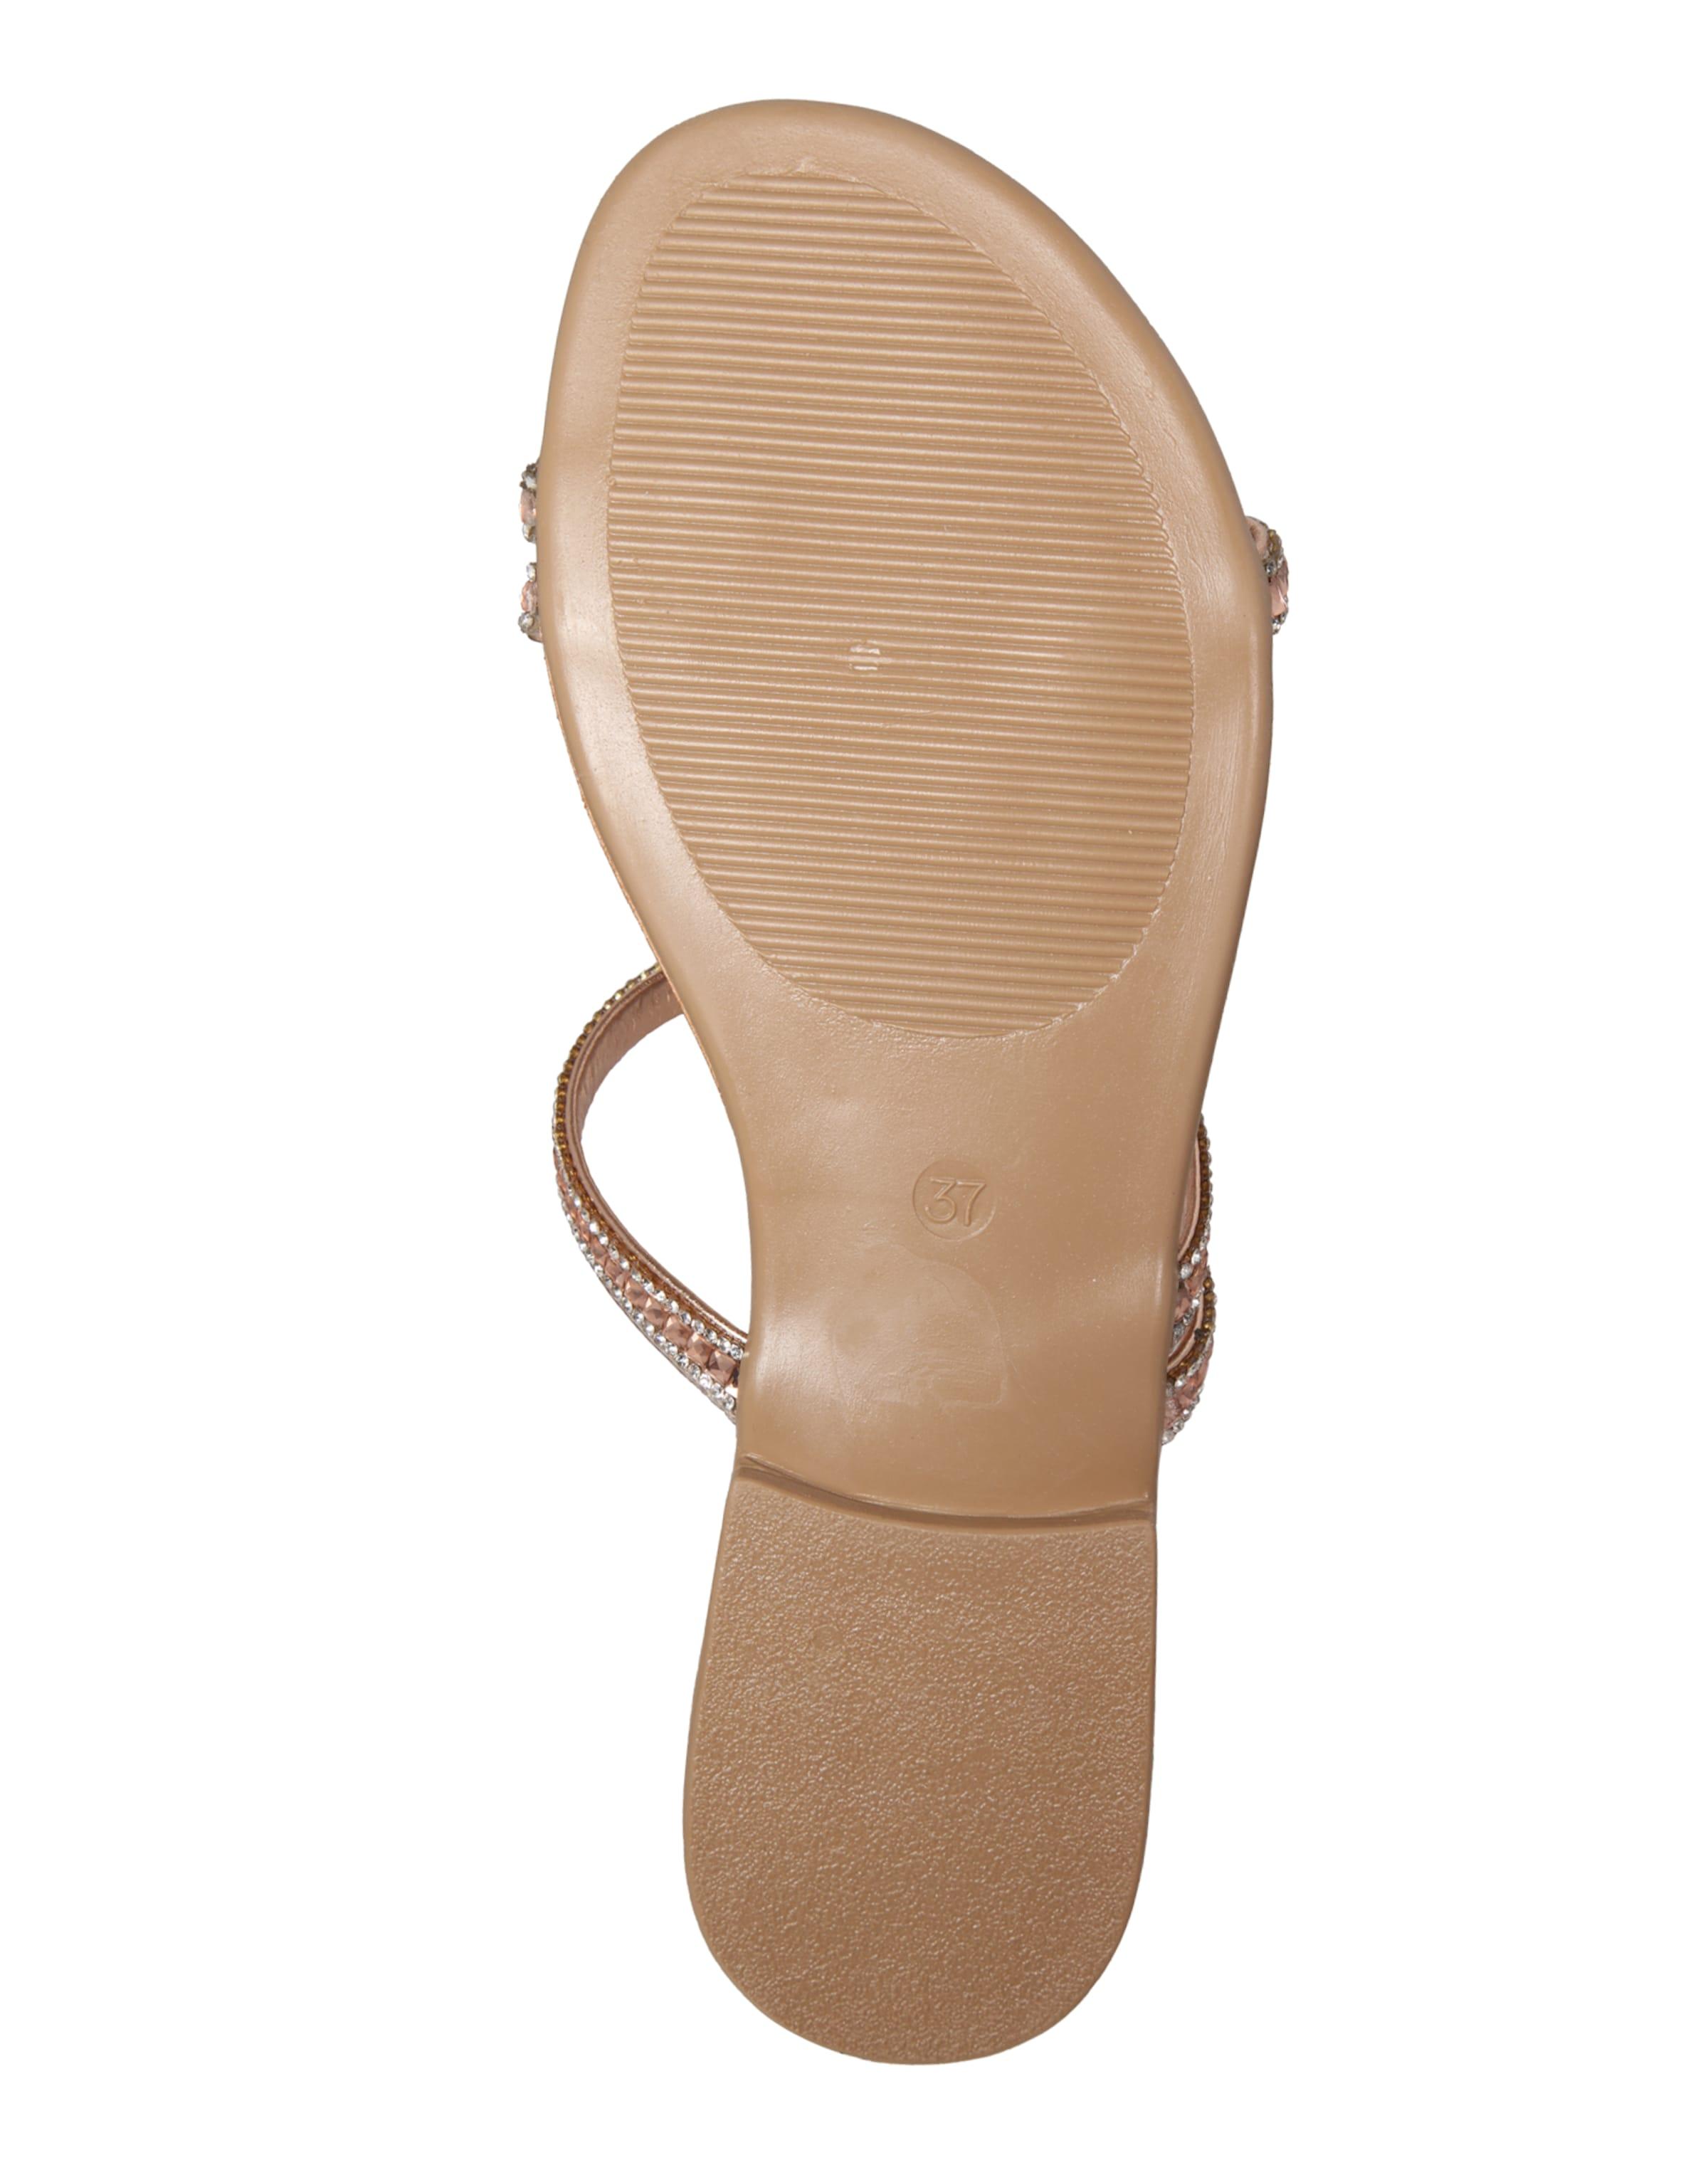 ESPRIT ESPRIT Sandalen Sandalen Nil zYcY5qx